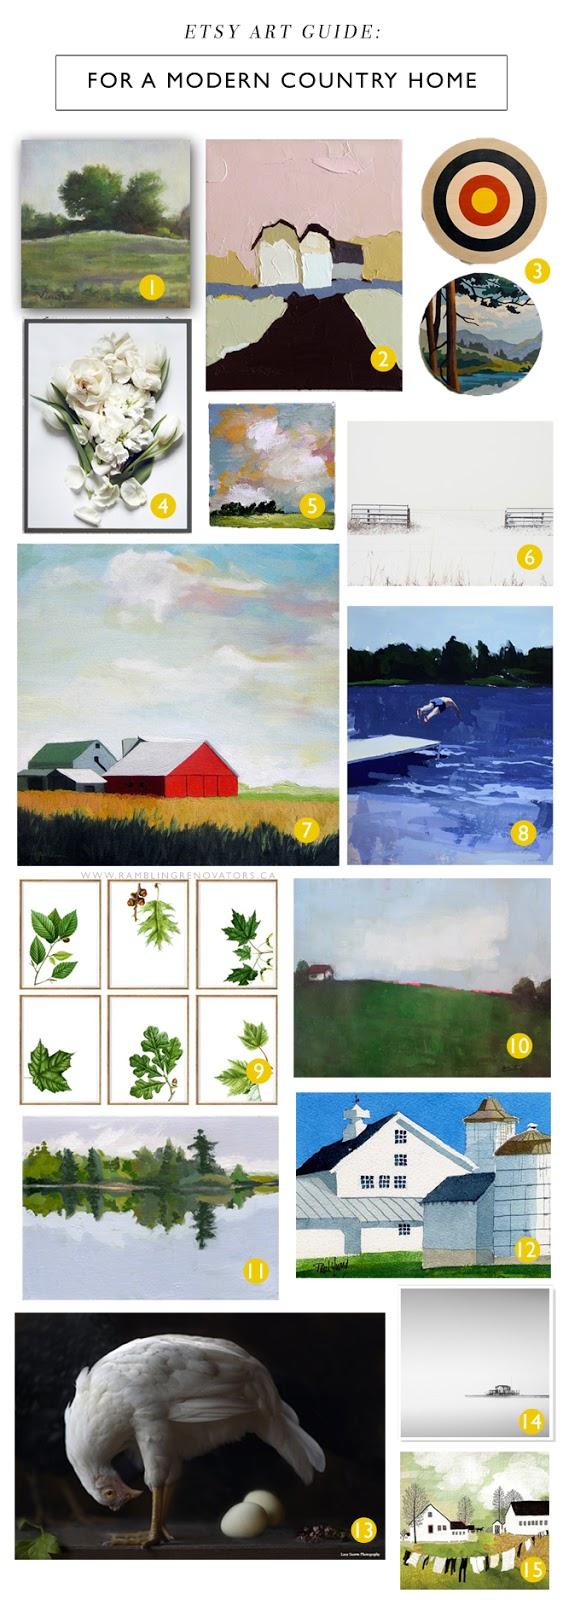 etsy art guide for the modern country home | ramblingrenovators.ca